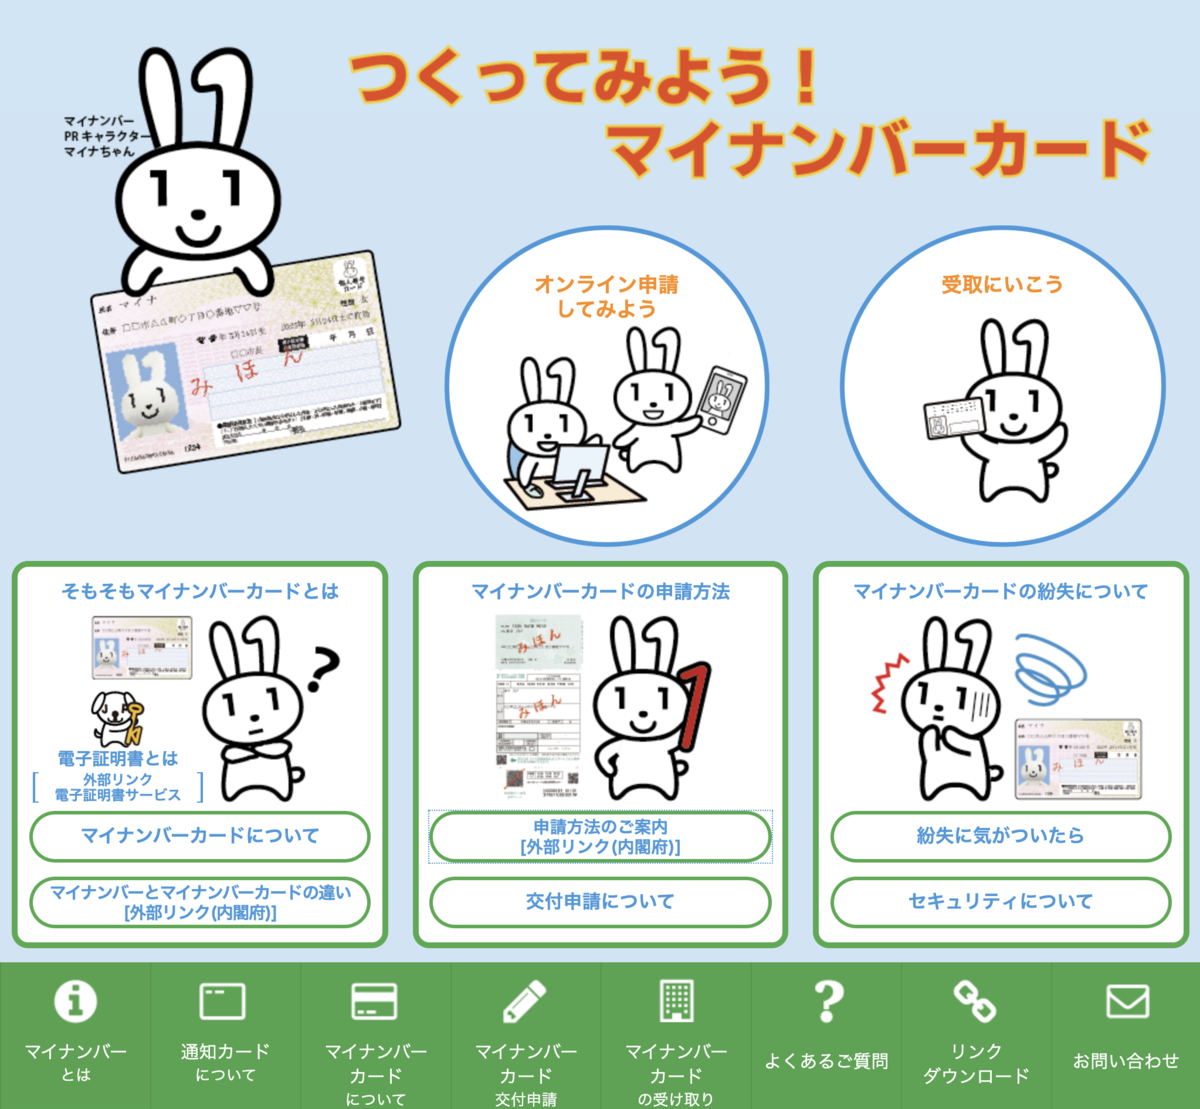 f:id:dachikusakun:20200523014522p:plain